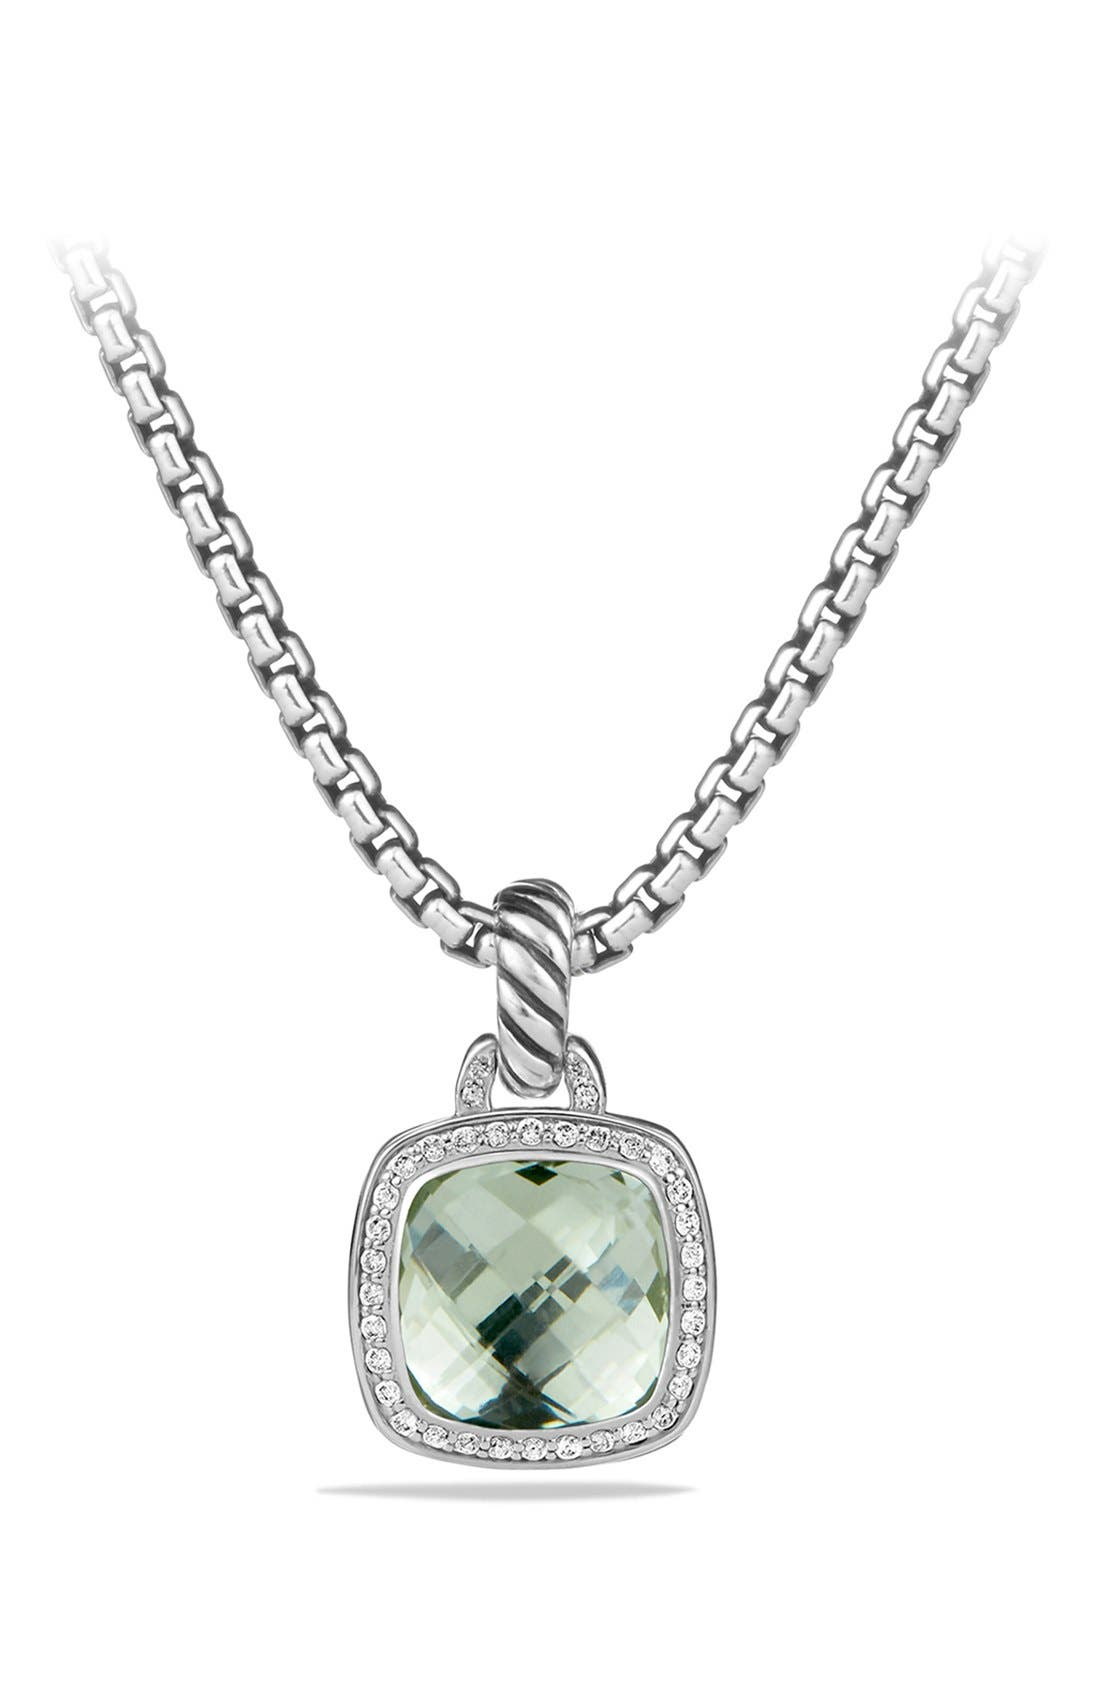 DAVID YURMAN Albion Pendant and Diamonds